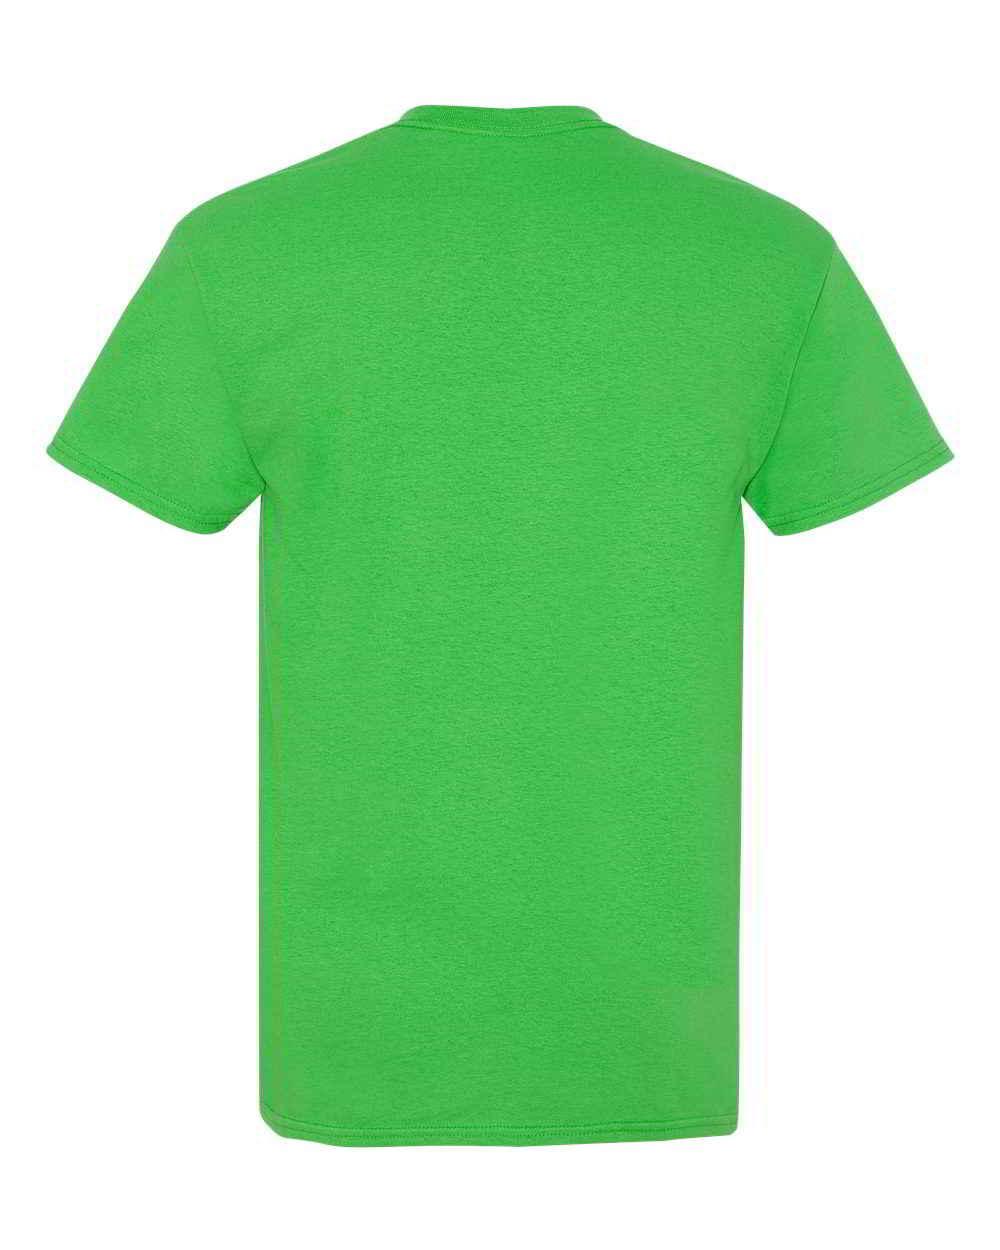 Gildan-Heavy-Cotton-Short-Sleeve-Mens-Green-T-Shirts-5000 thumbnail 5